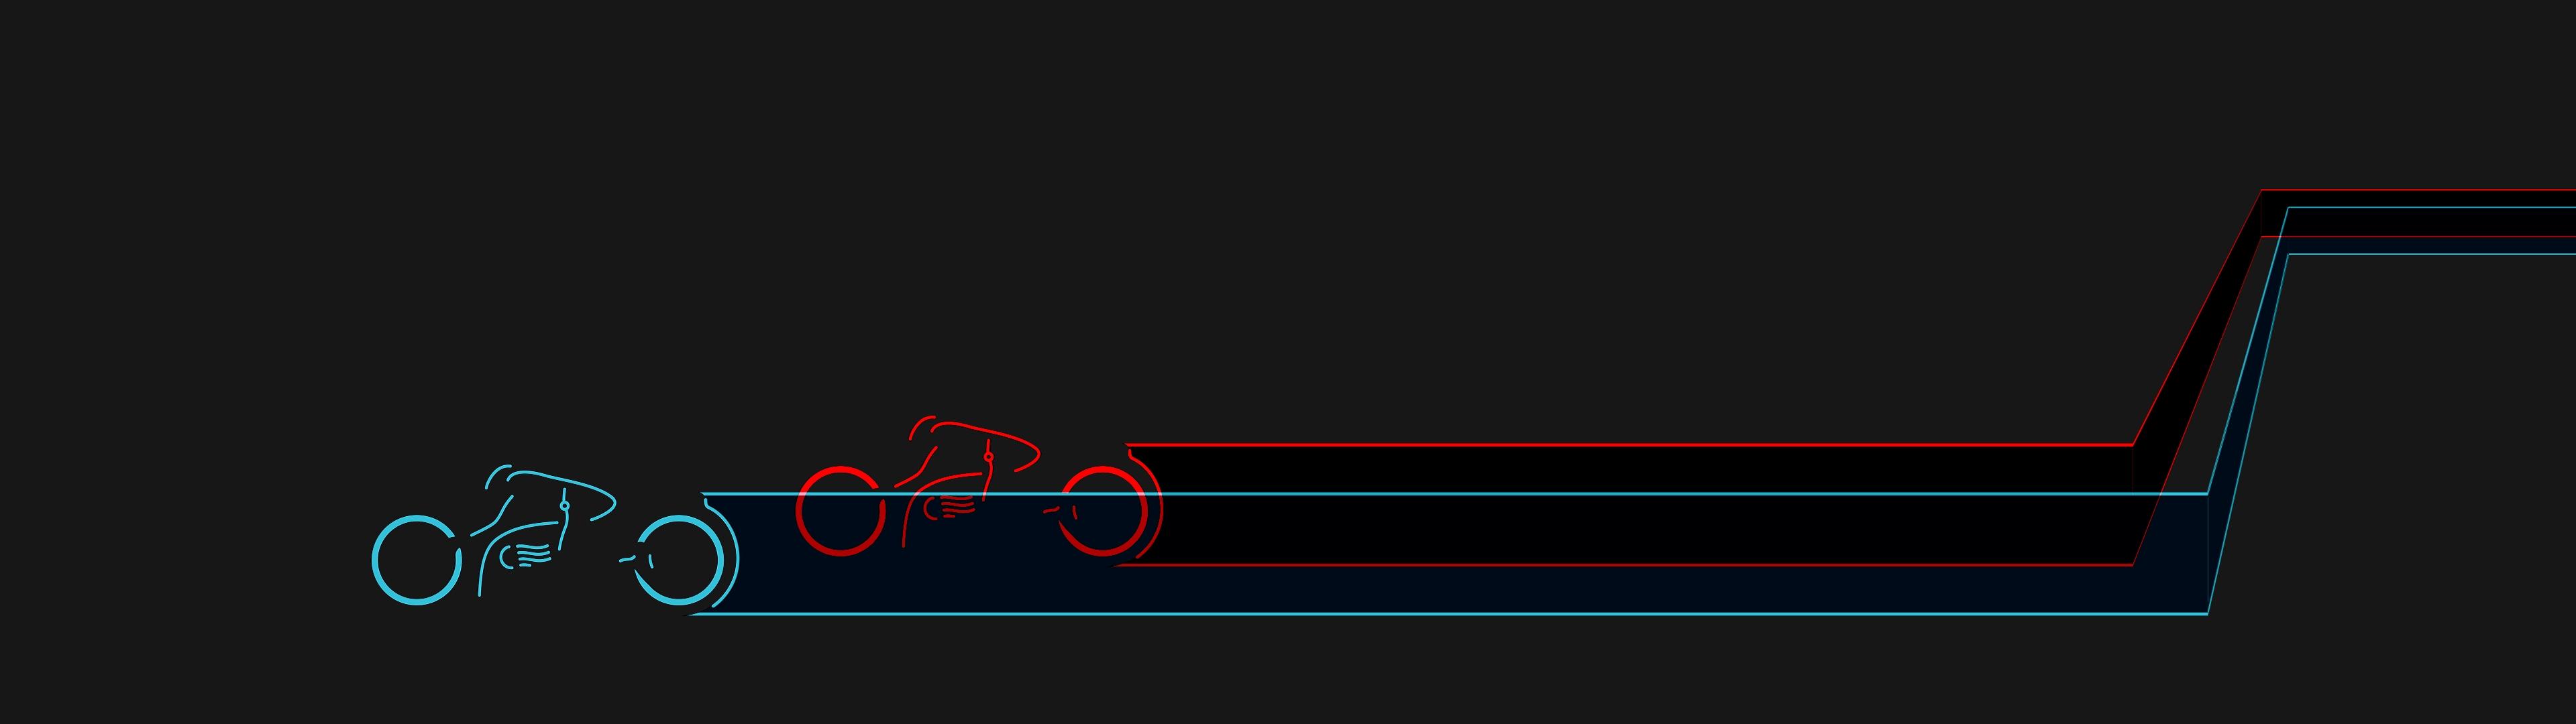 tron cycles redux - dual screen [3840x1080] : wallpaper